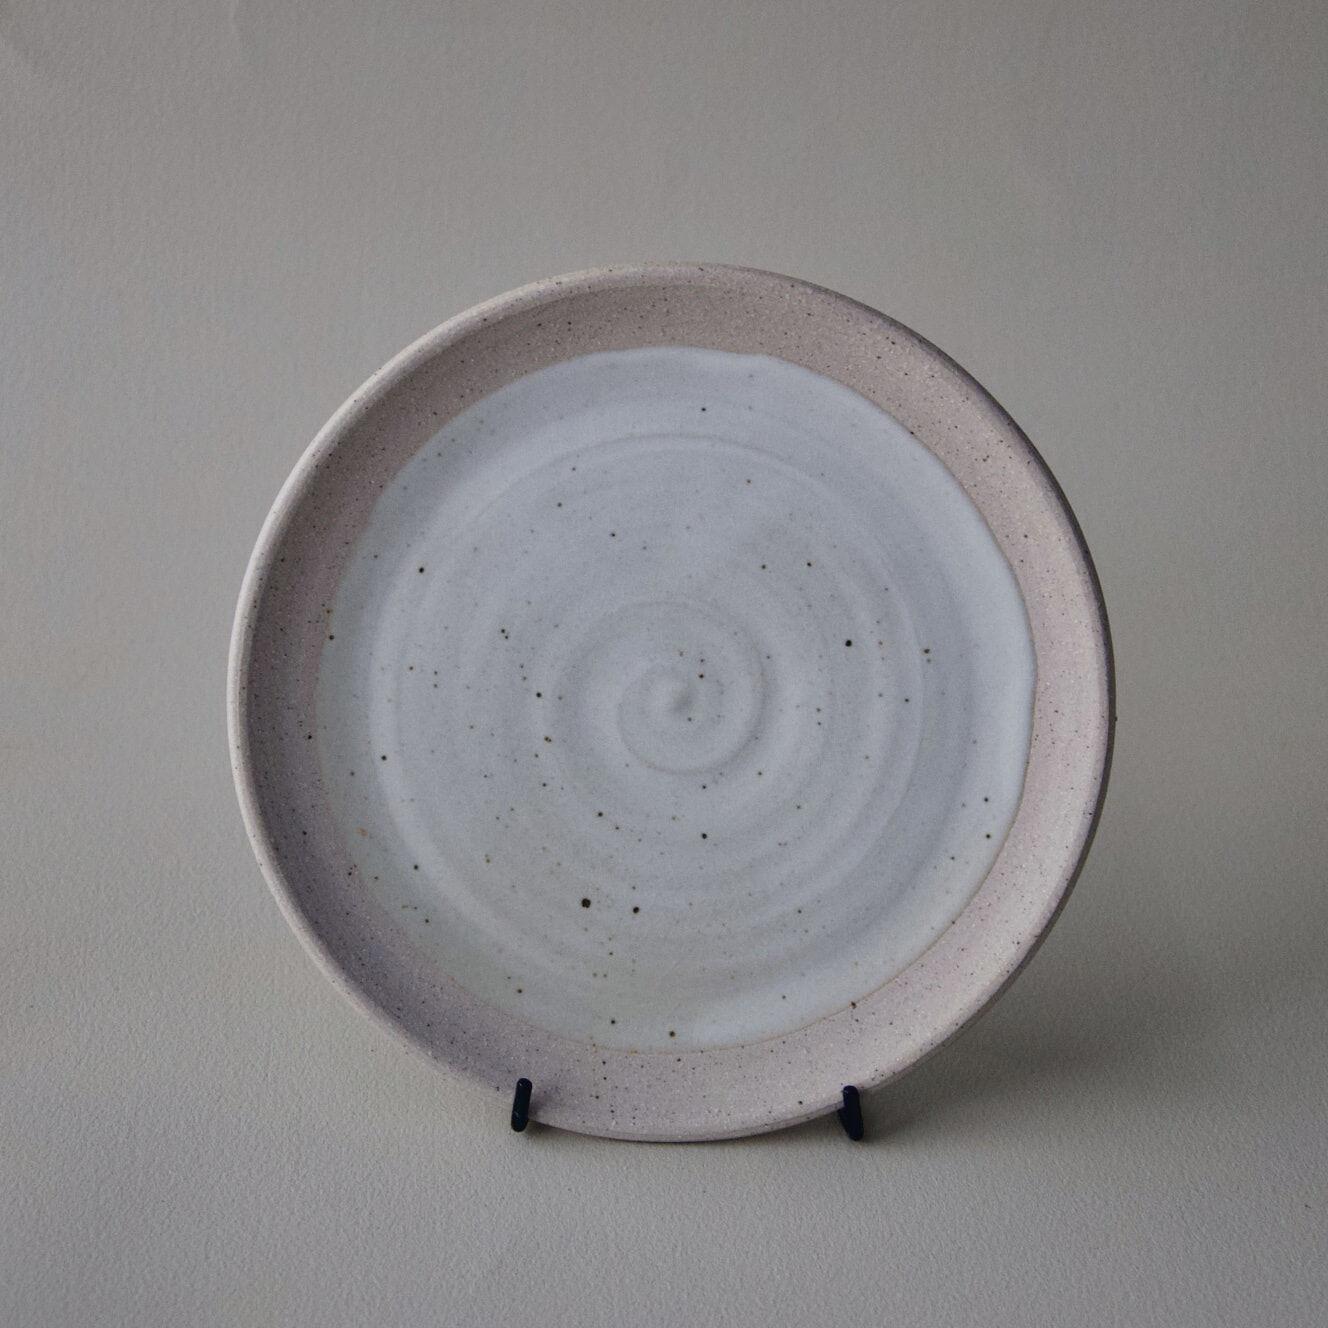 BFast Plate01a-JHendy8:21